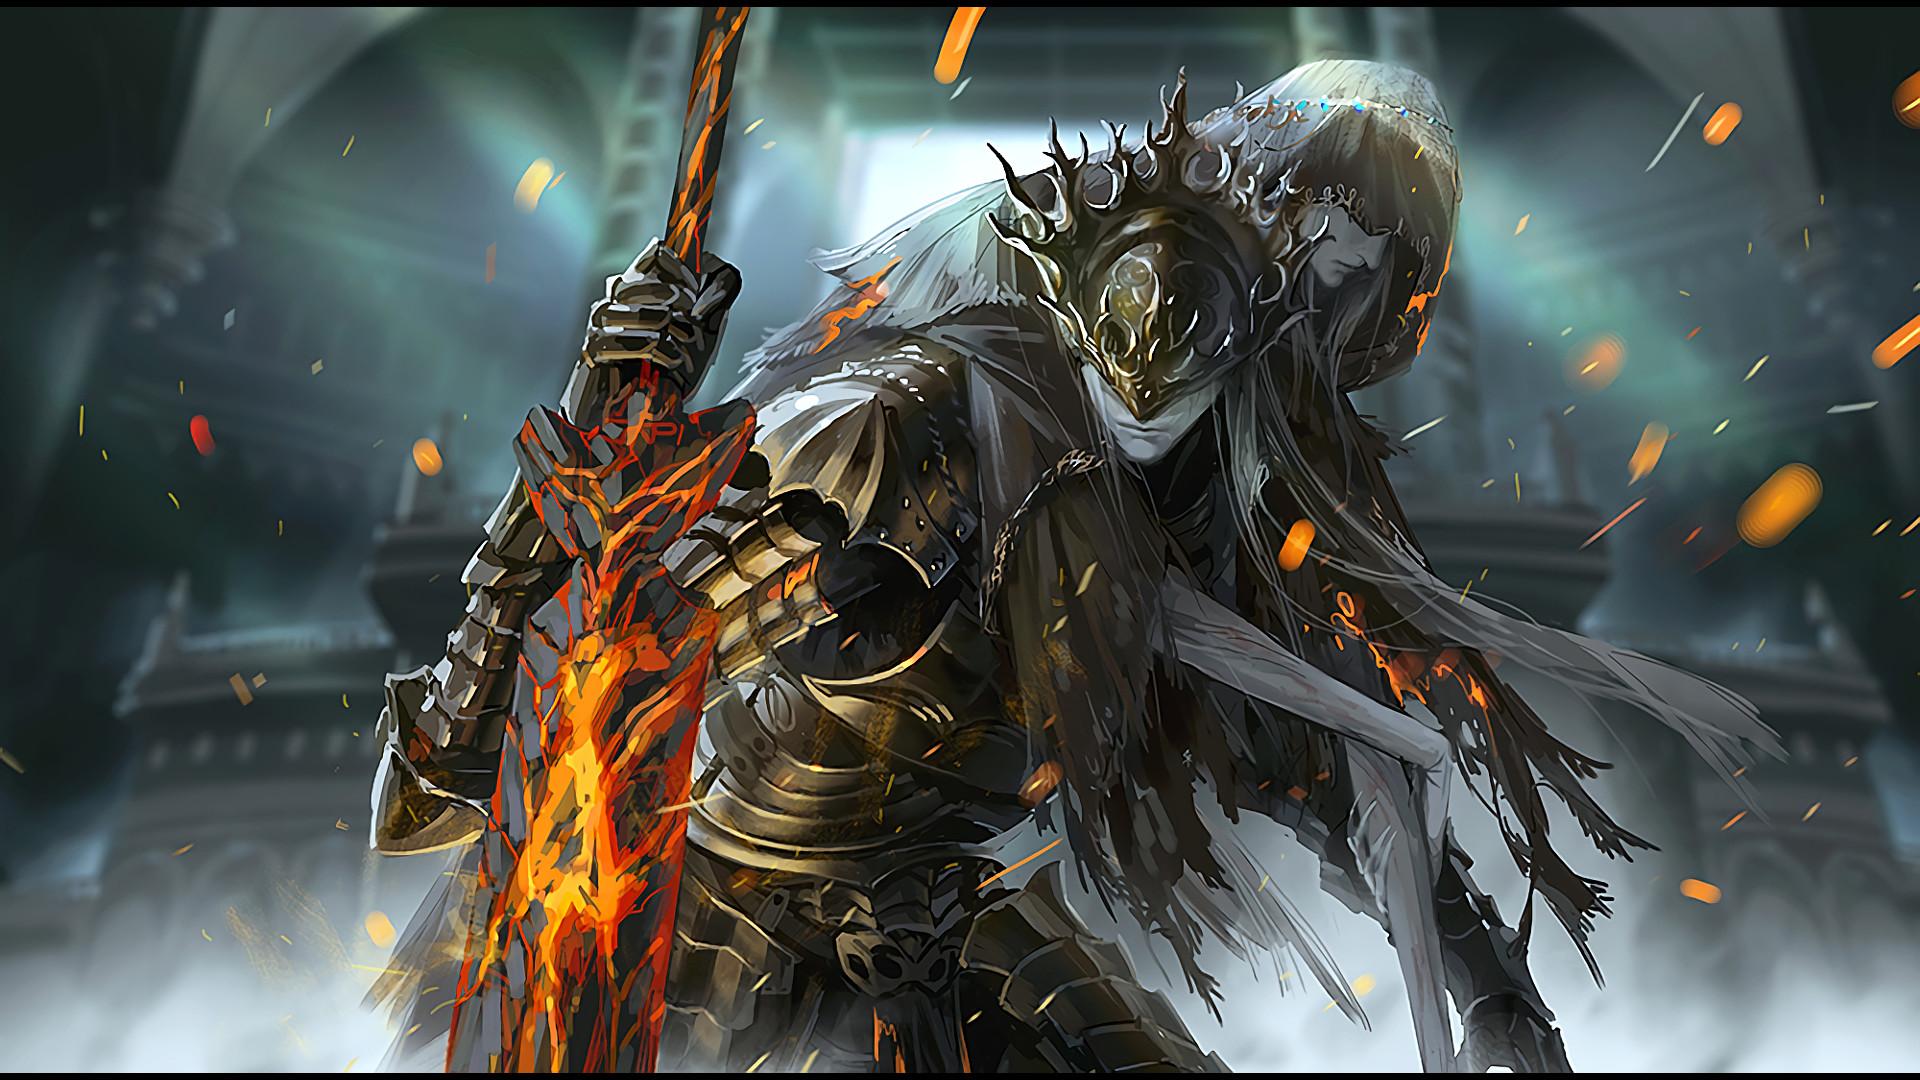 Dark Souls 3 Live Wallpaper 81 Images